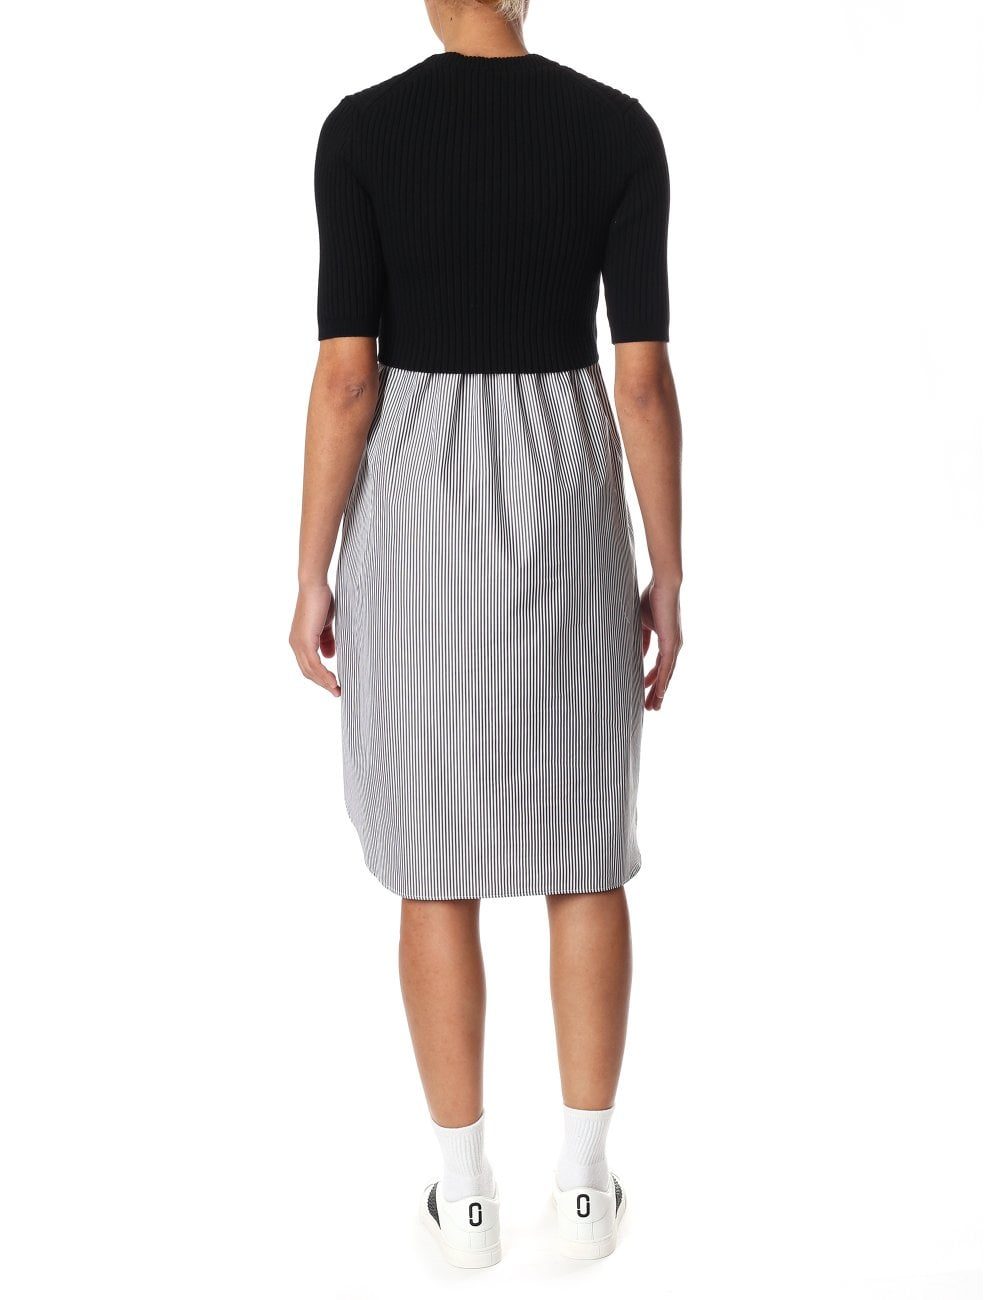 634fc08a60 Kenzo Women's Shirt Dress Black